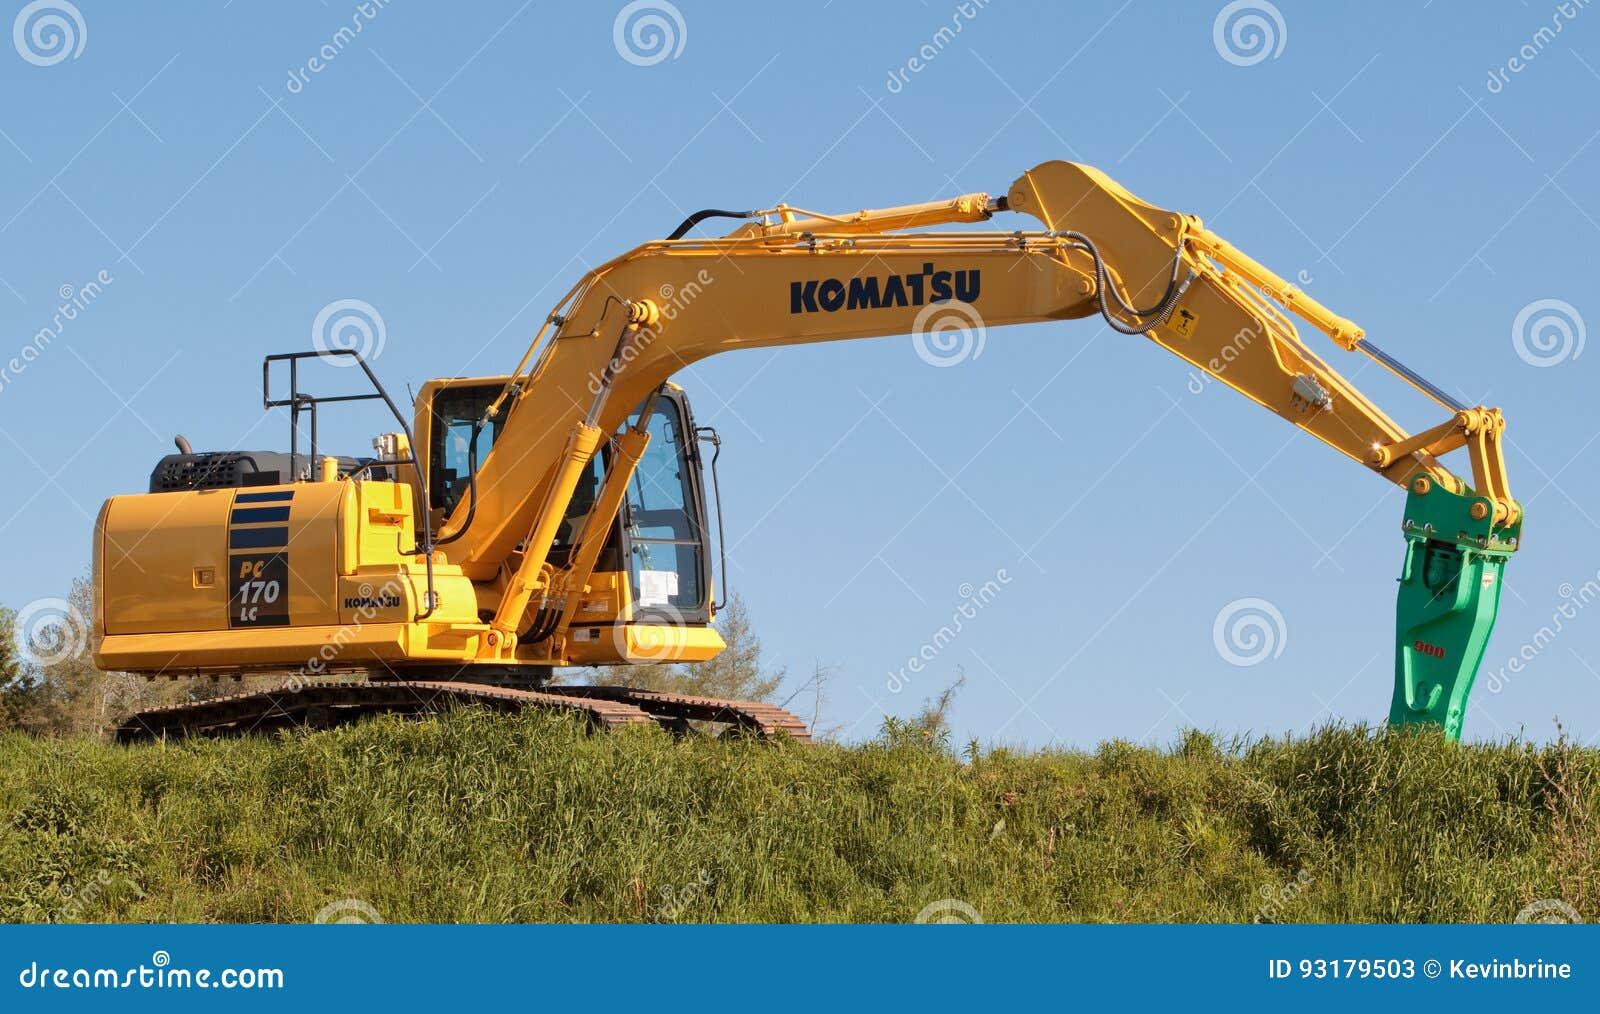 Komatsu Excavator editorial stock photo  Image of industrial